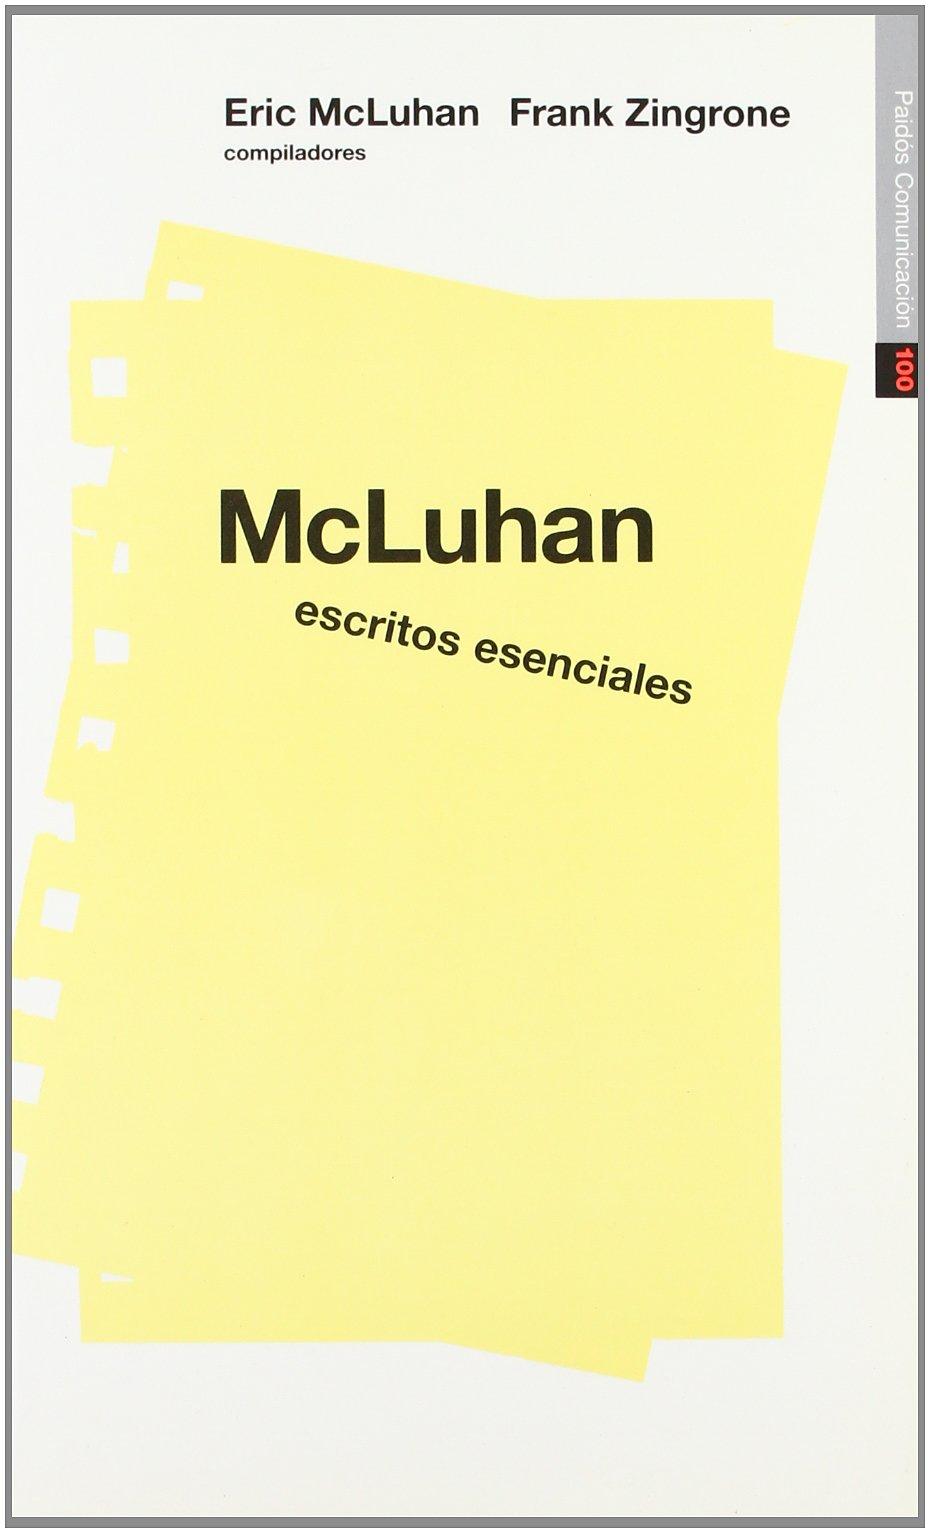 McLuhan escritos esenciales (Comunicación) Tapa blanda – 16 oct 1998 Eric McLuhan Ediciones Paidós 8449305322 Media Studies